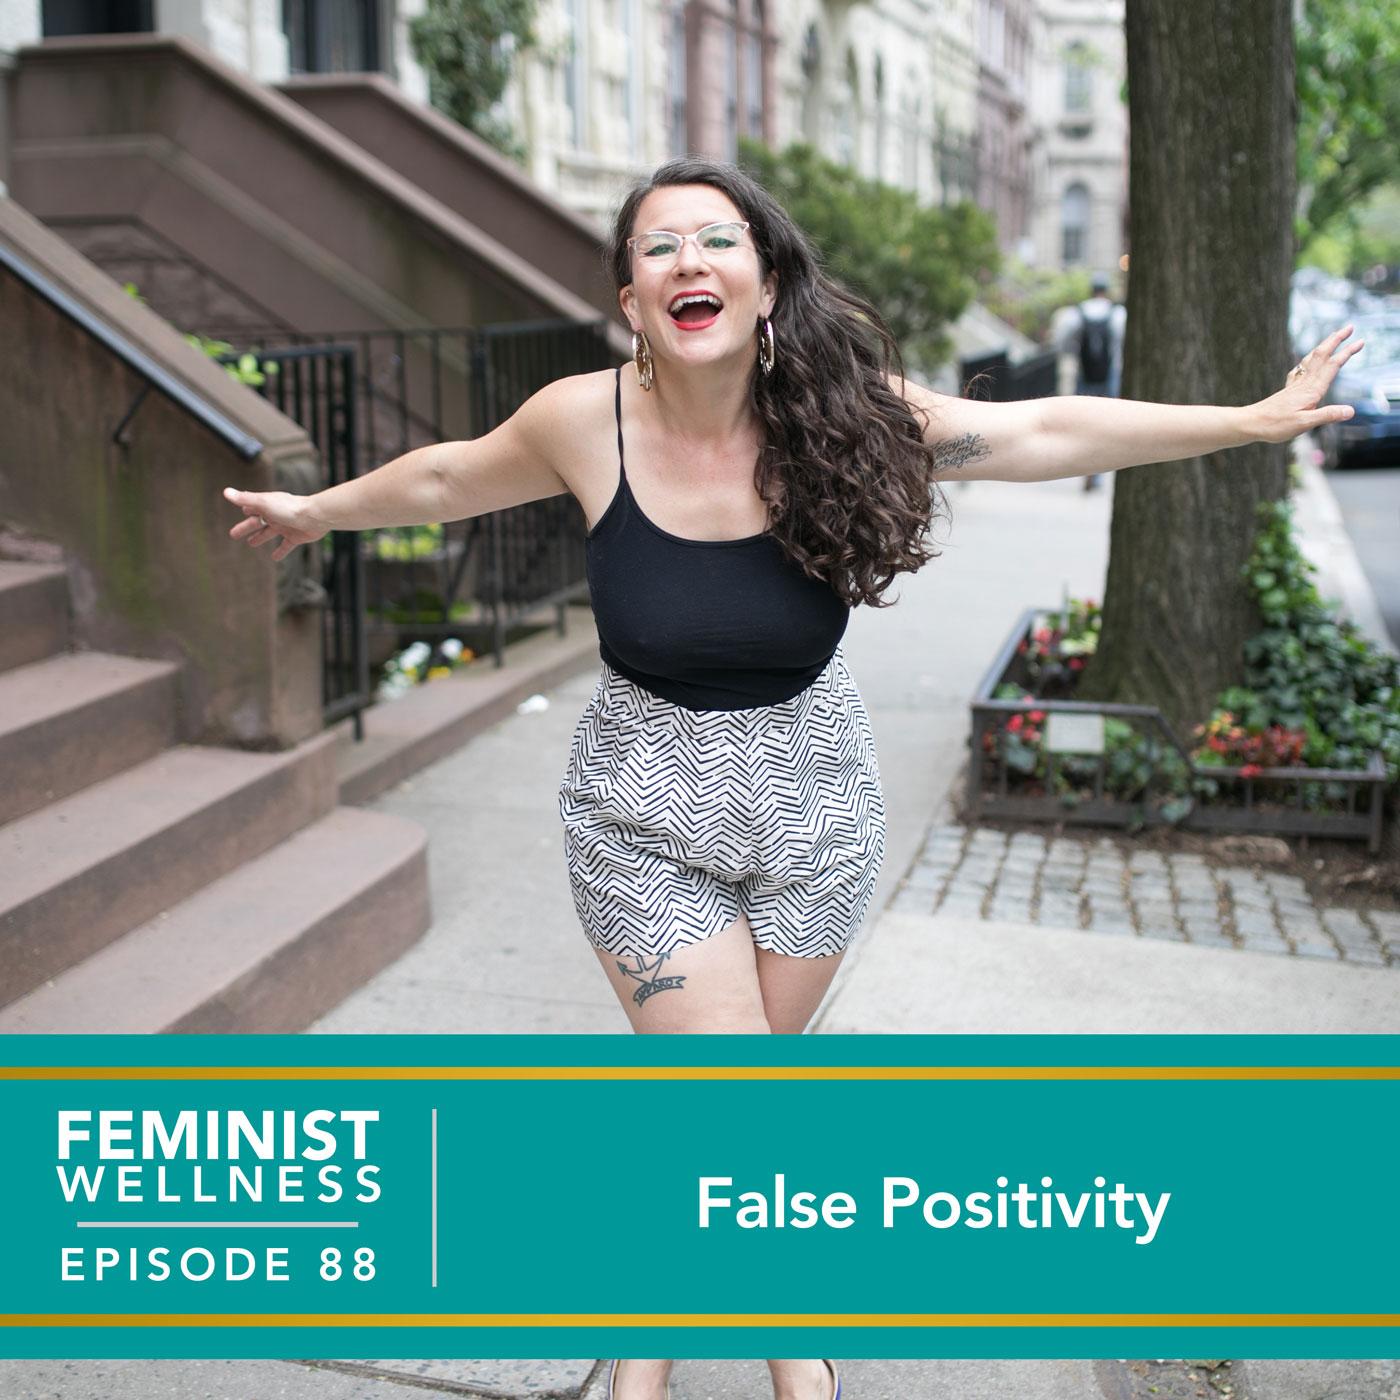 False Positivity